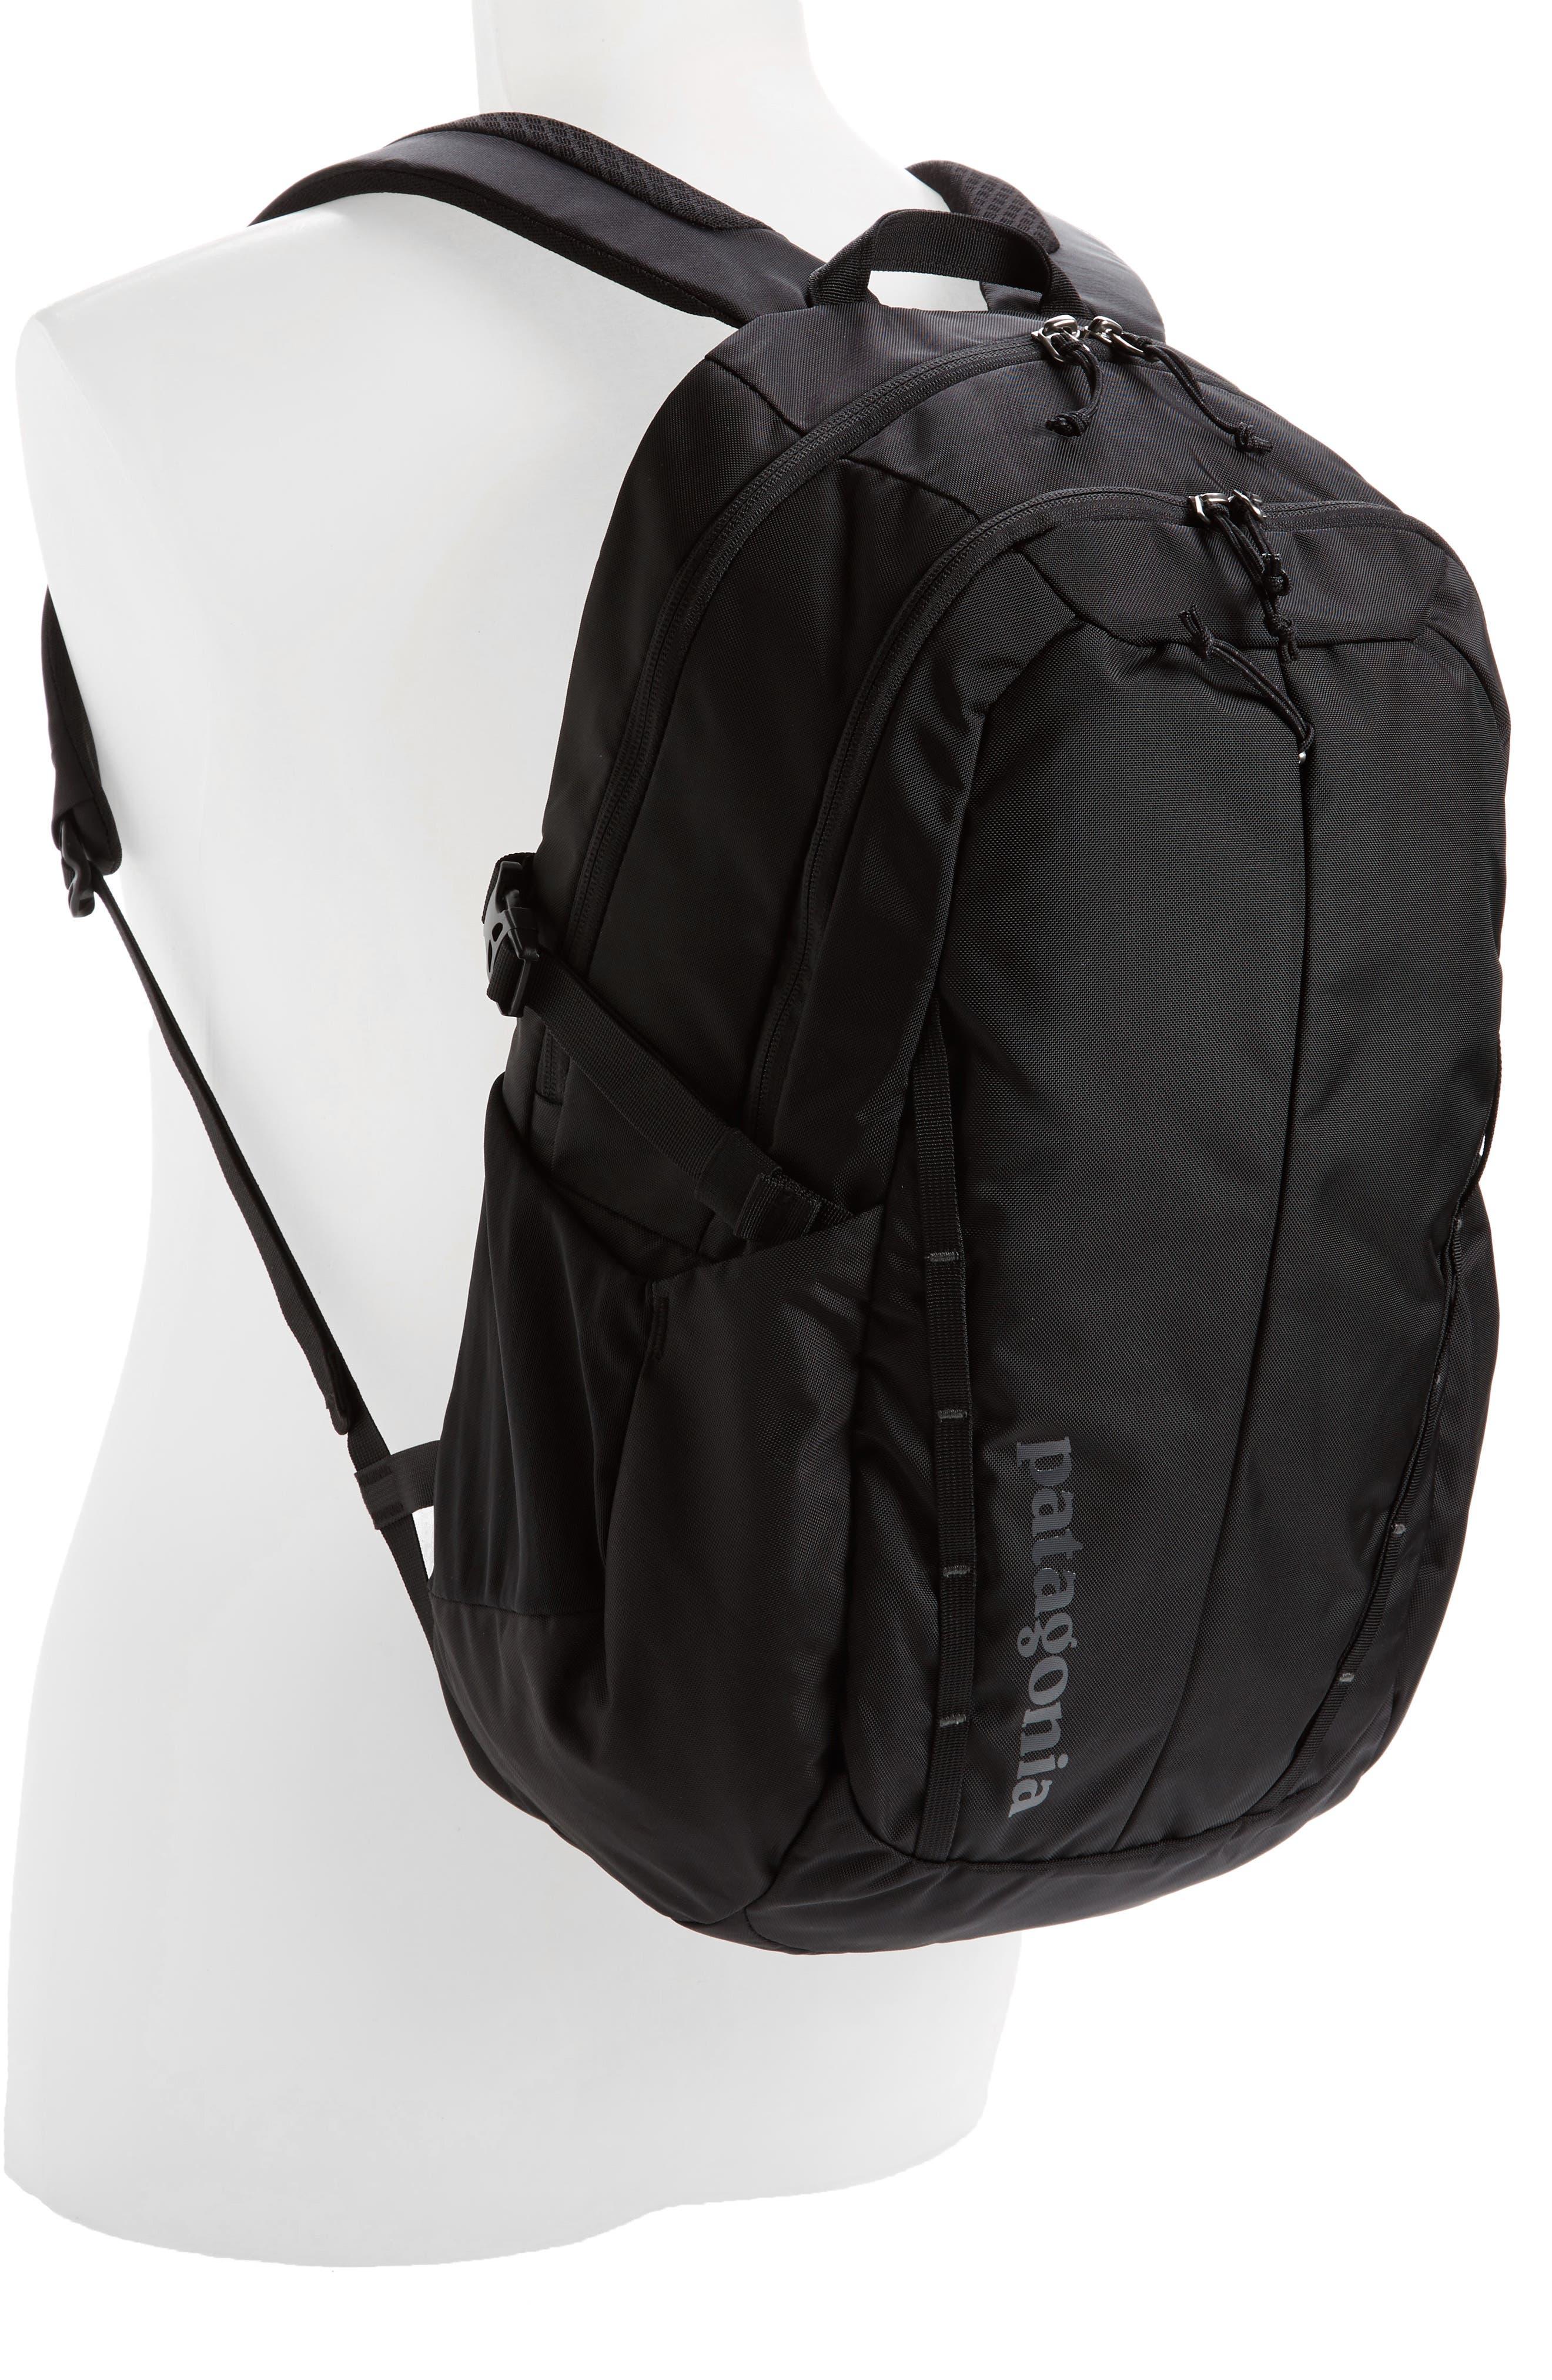 28L Refugio Backpack,                             Alternate thumbnail 2, color,                             Black